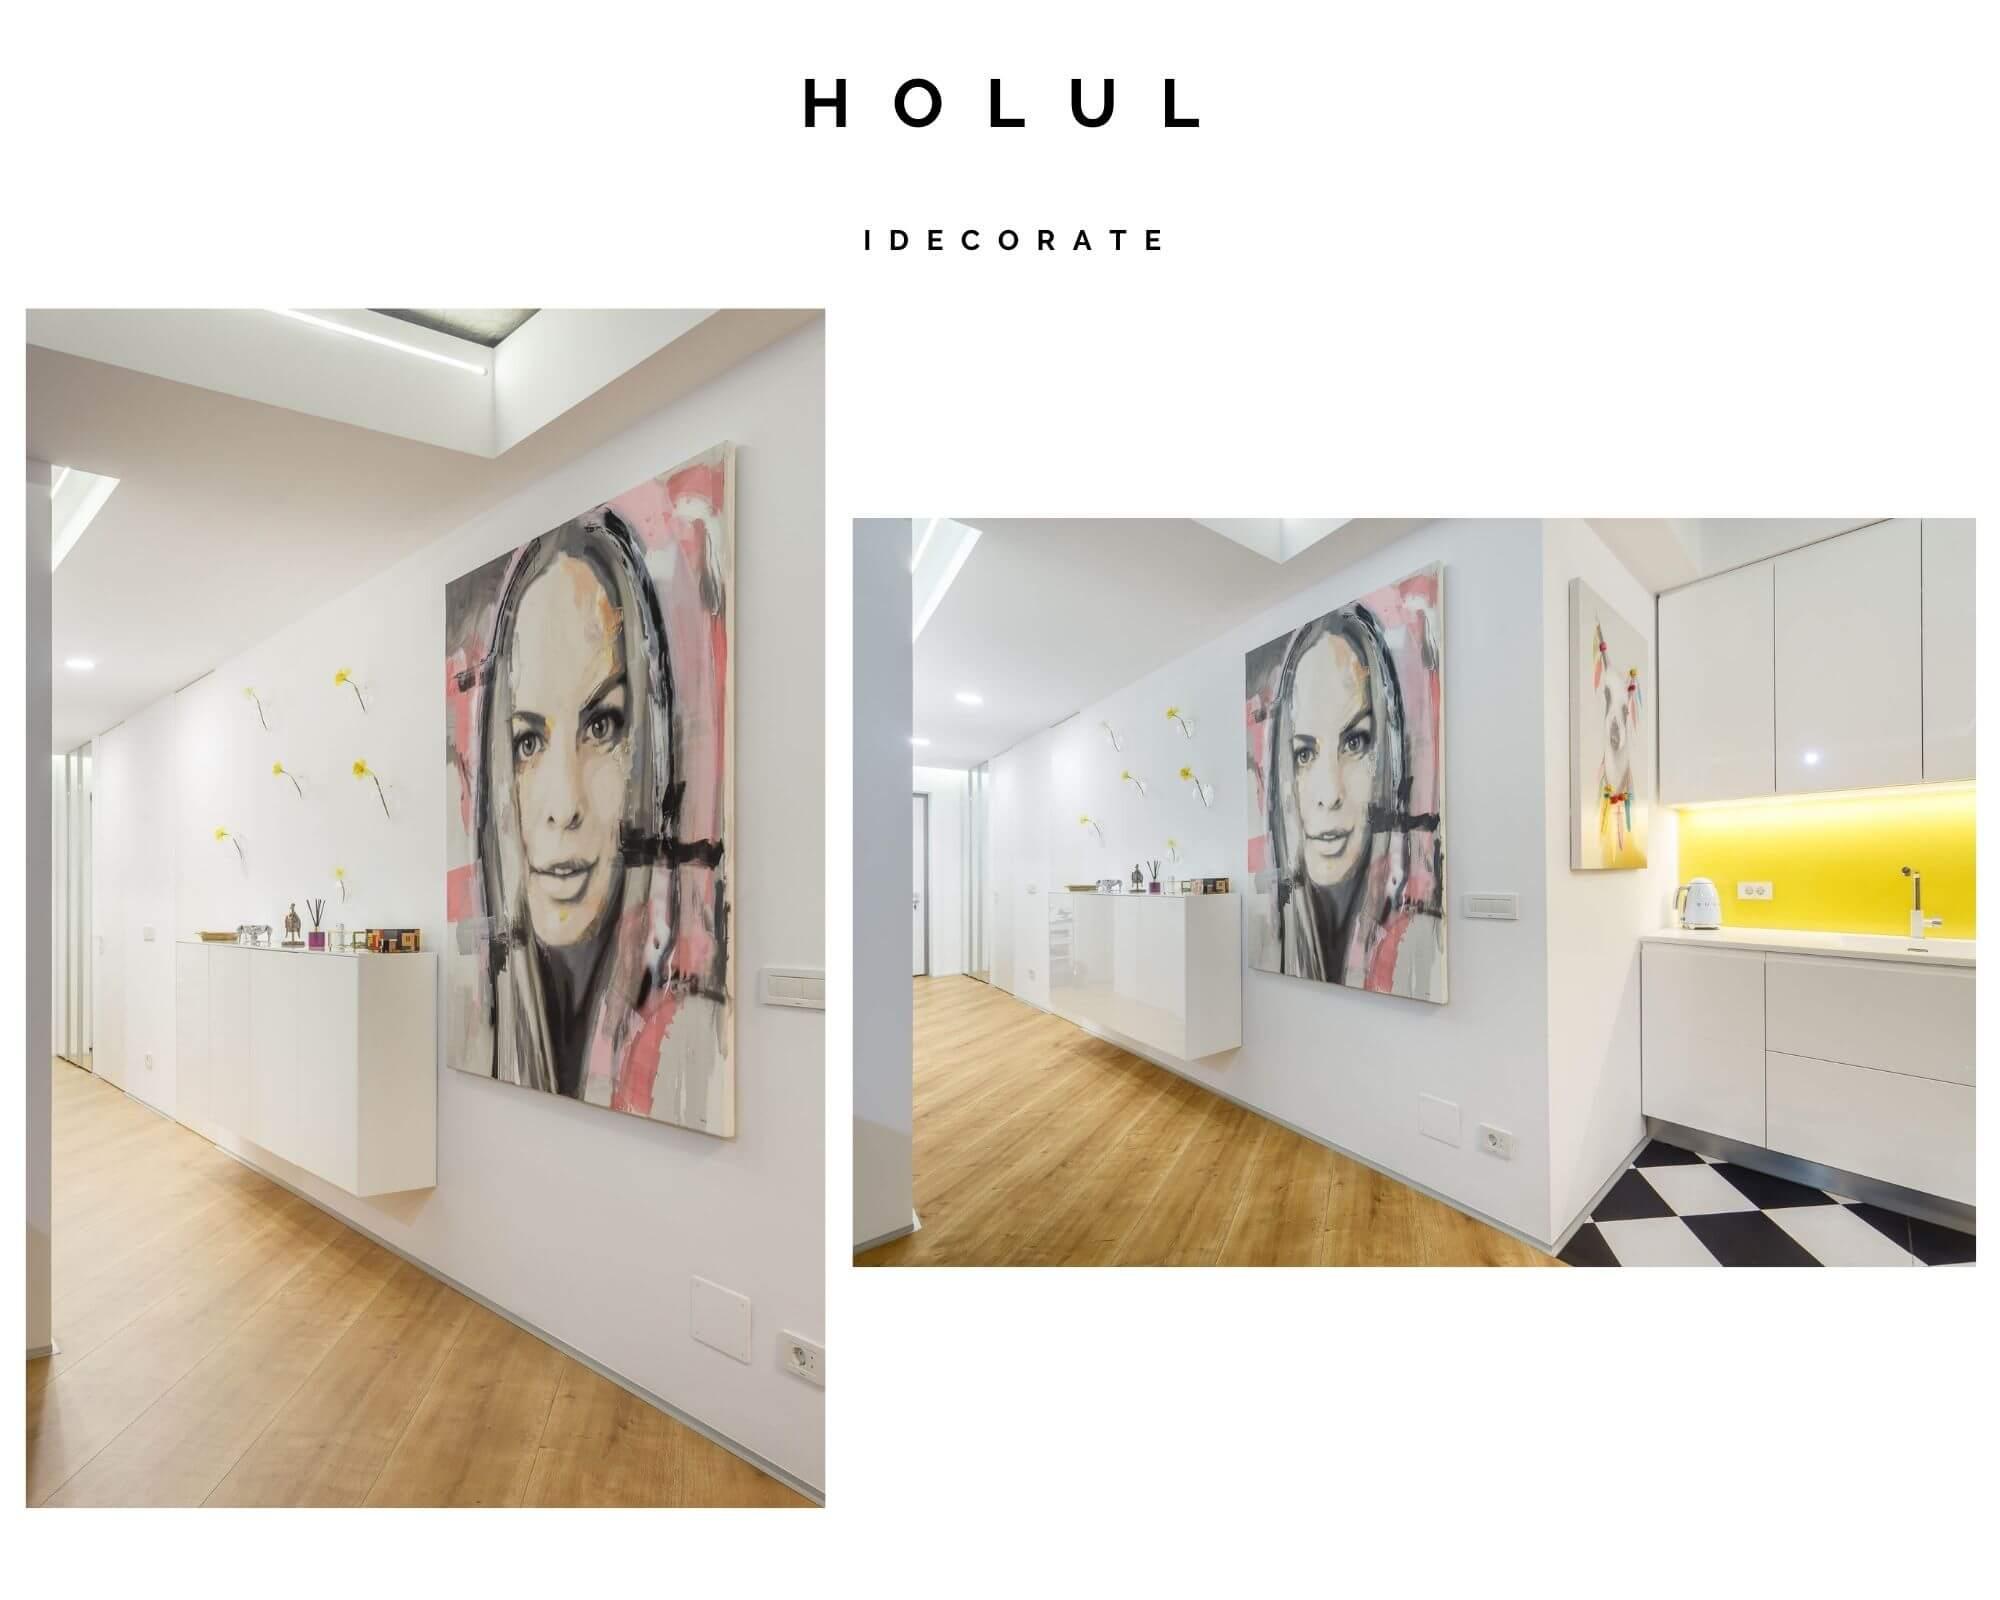 Our work – apartament cu 3 camere luminos cu accente de galben și albastru